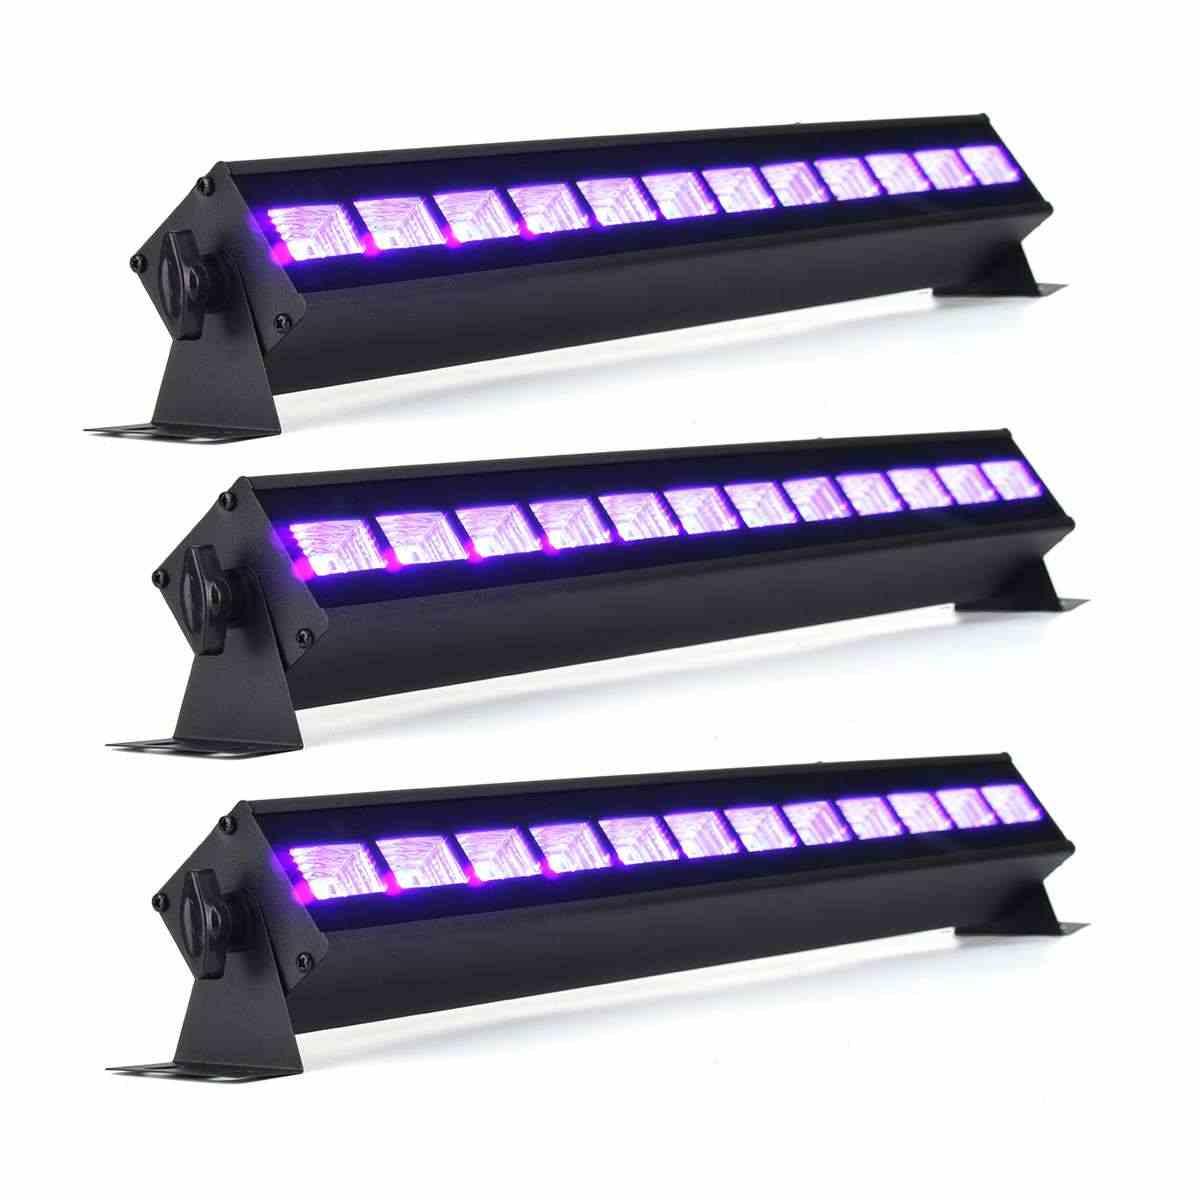 Led Uv ブラックライト舞台照明エフェクト屋内バー DJ ディスコパーティー 36 ワット 12 LED ブラックライト UV ランプ LED ストリップライトパーティークラブ